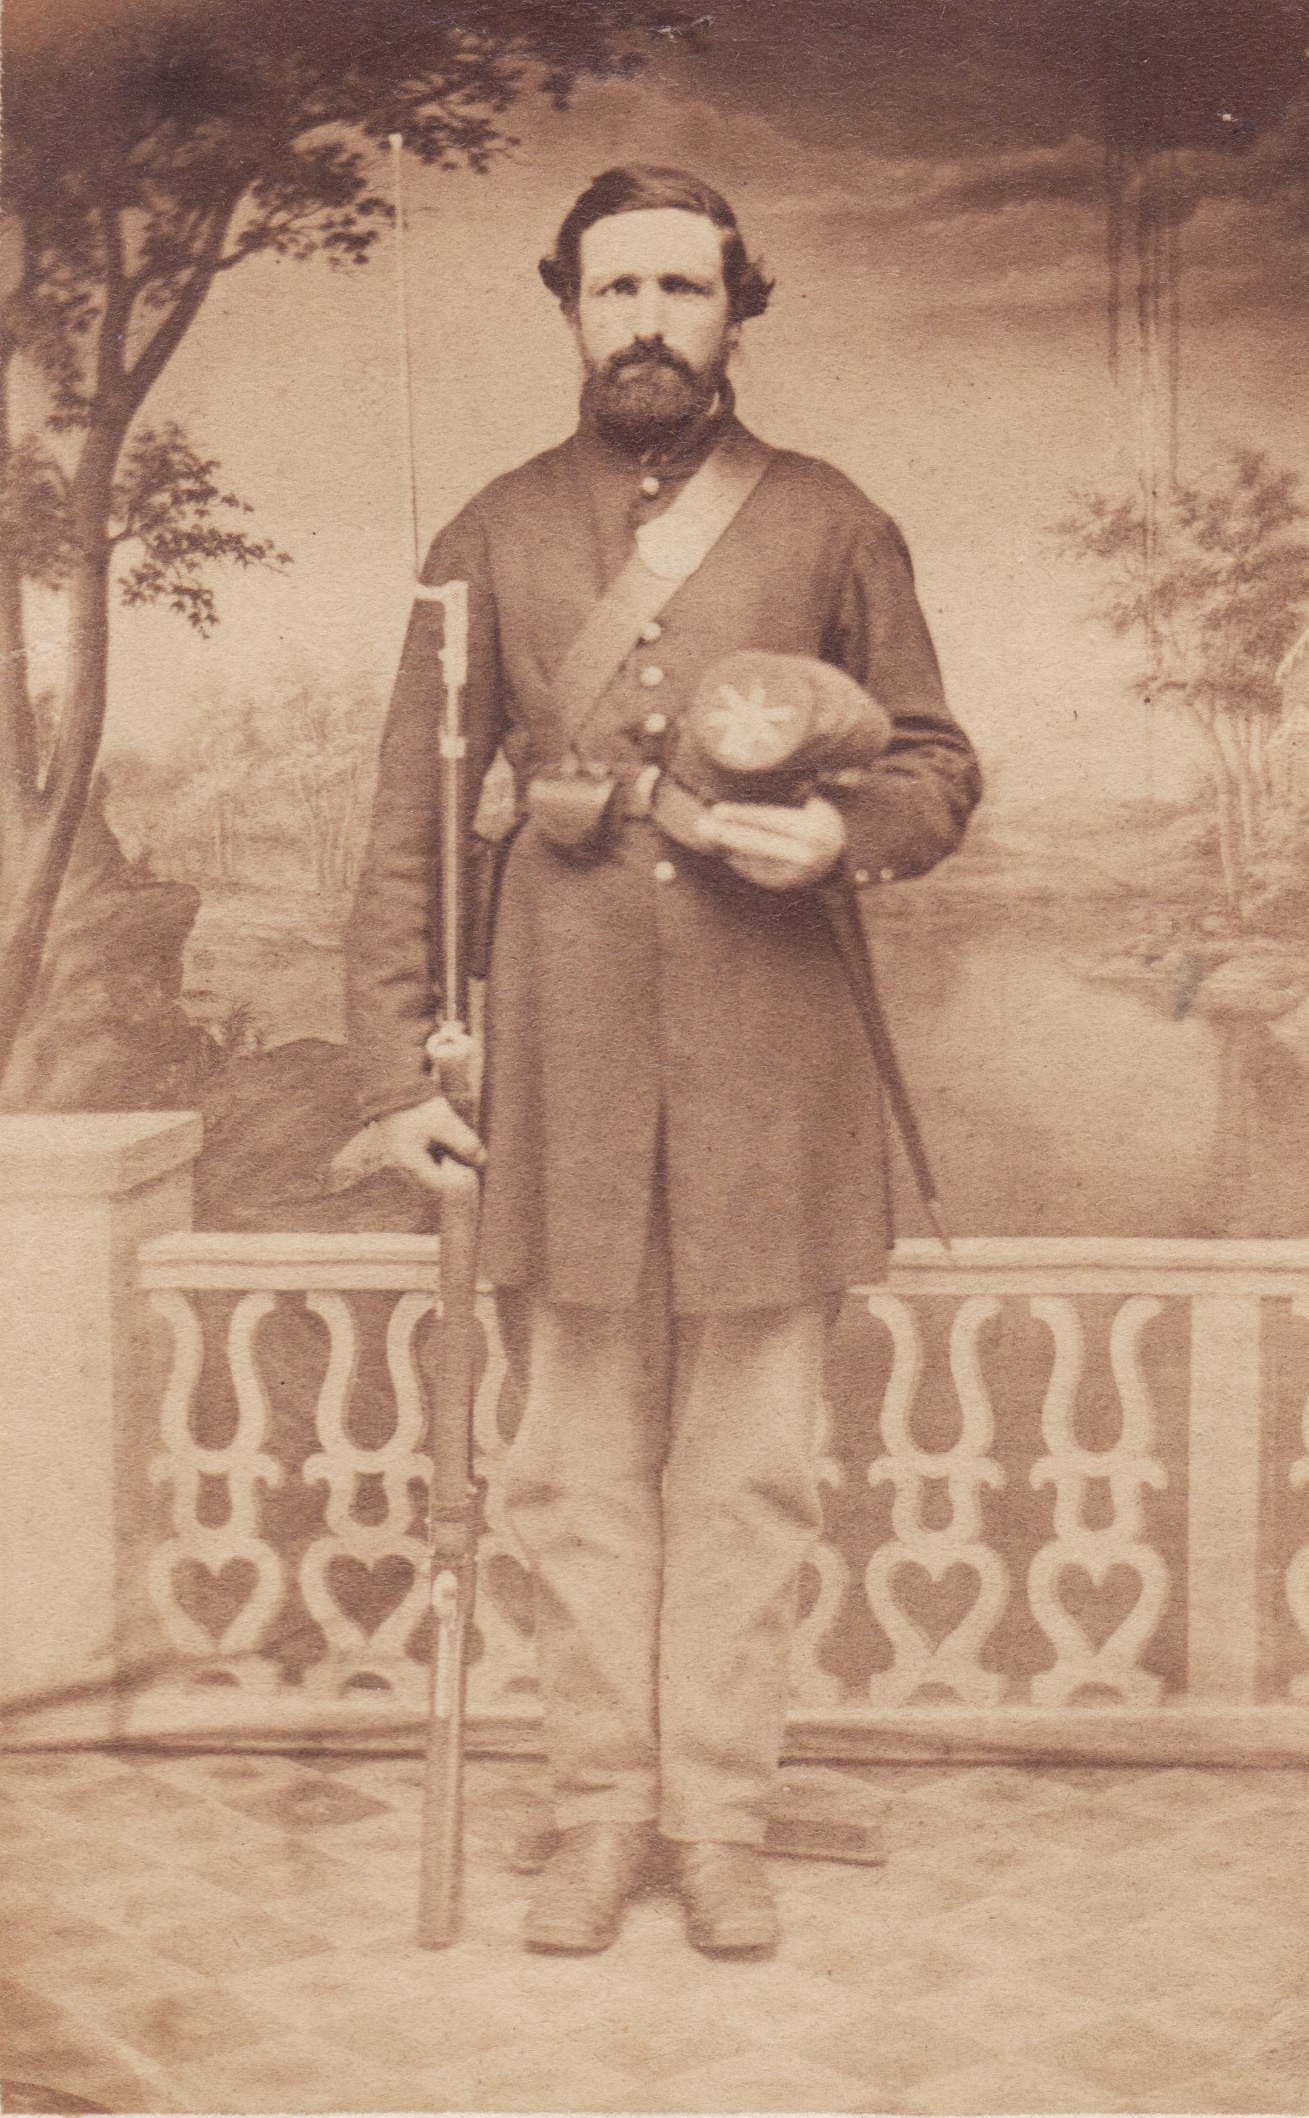 DAVID JOHNSON UNION SOLDIER (2)